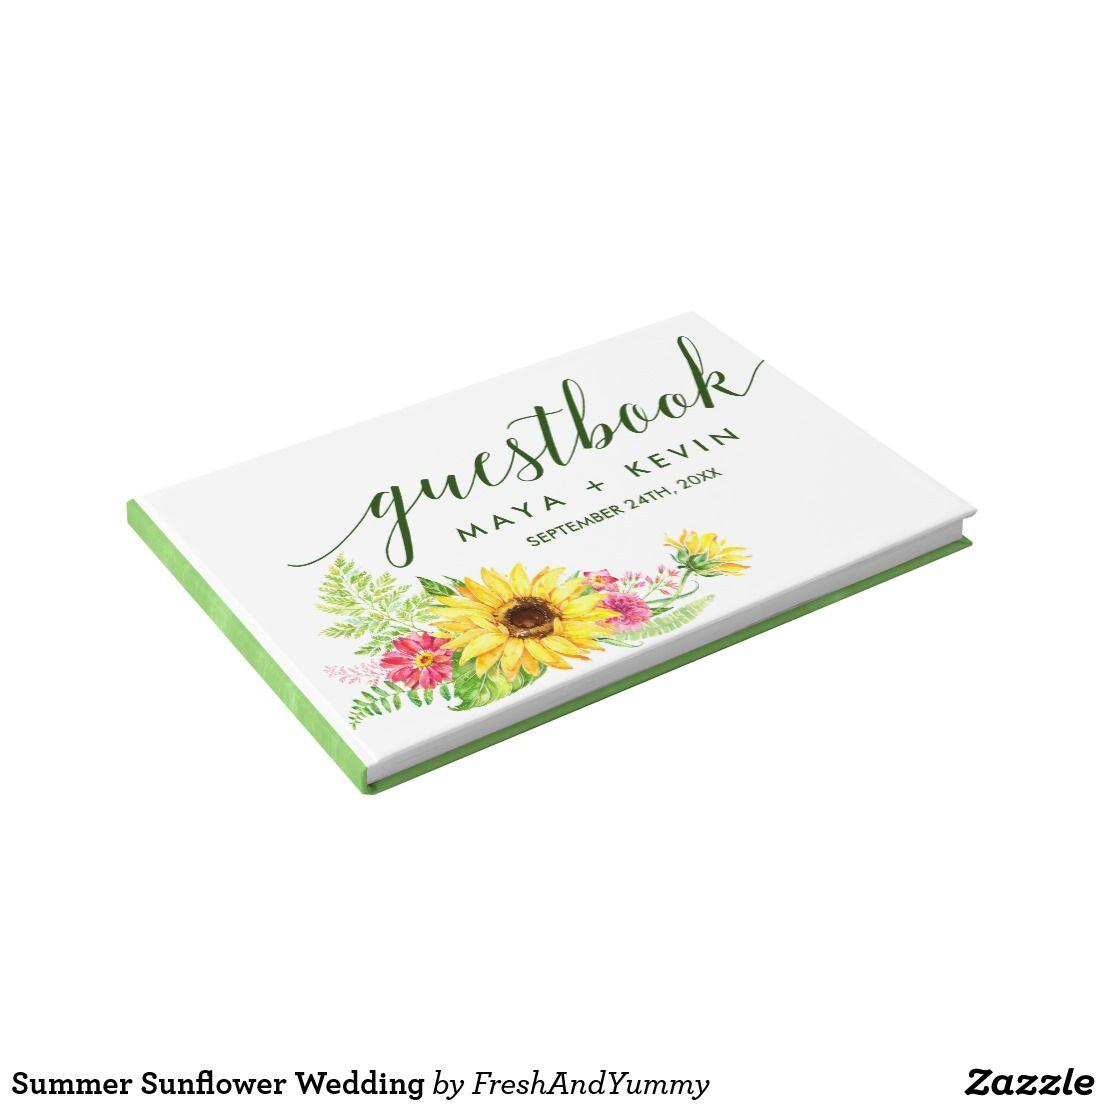 Summer Sunflower Wedding Guest Book   Wedding Invitations  Favors